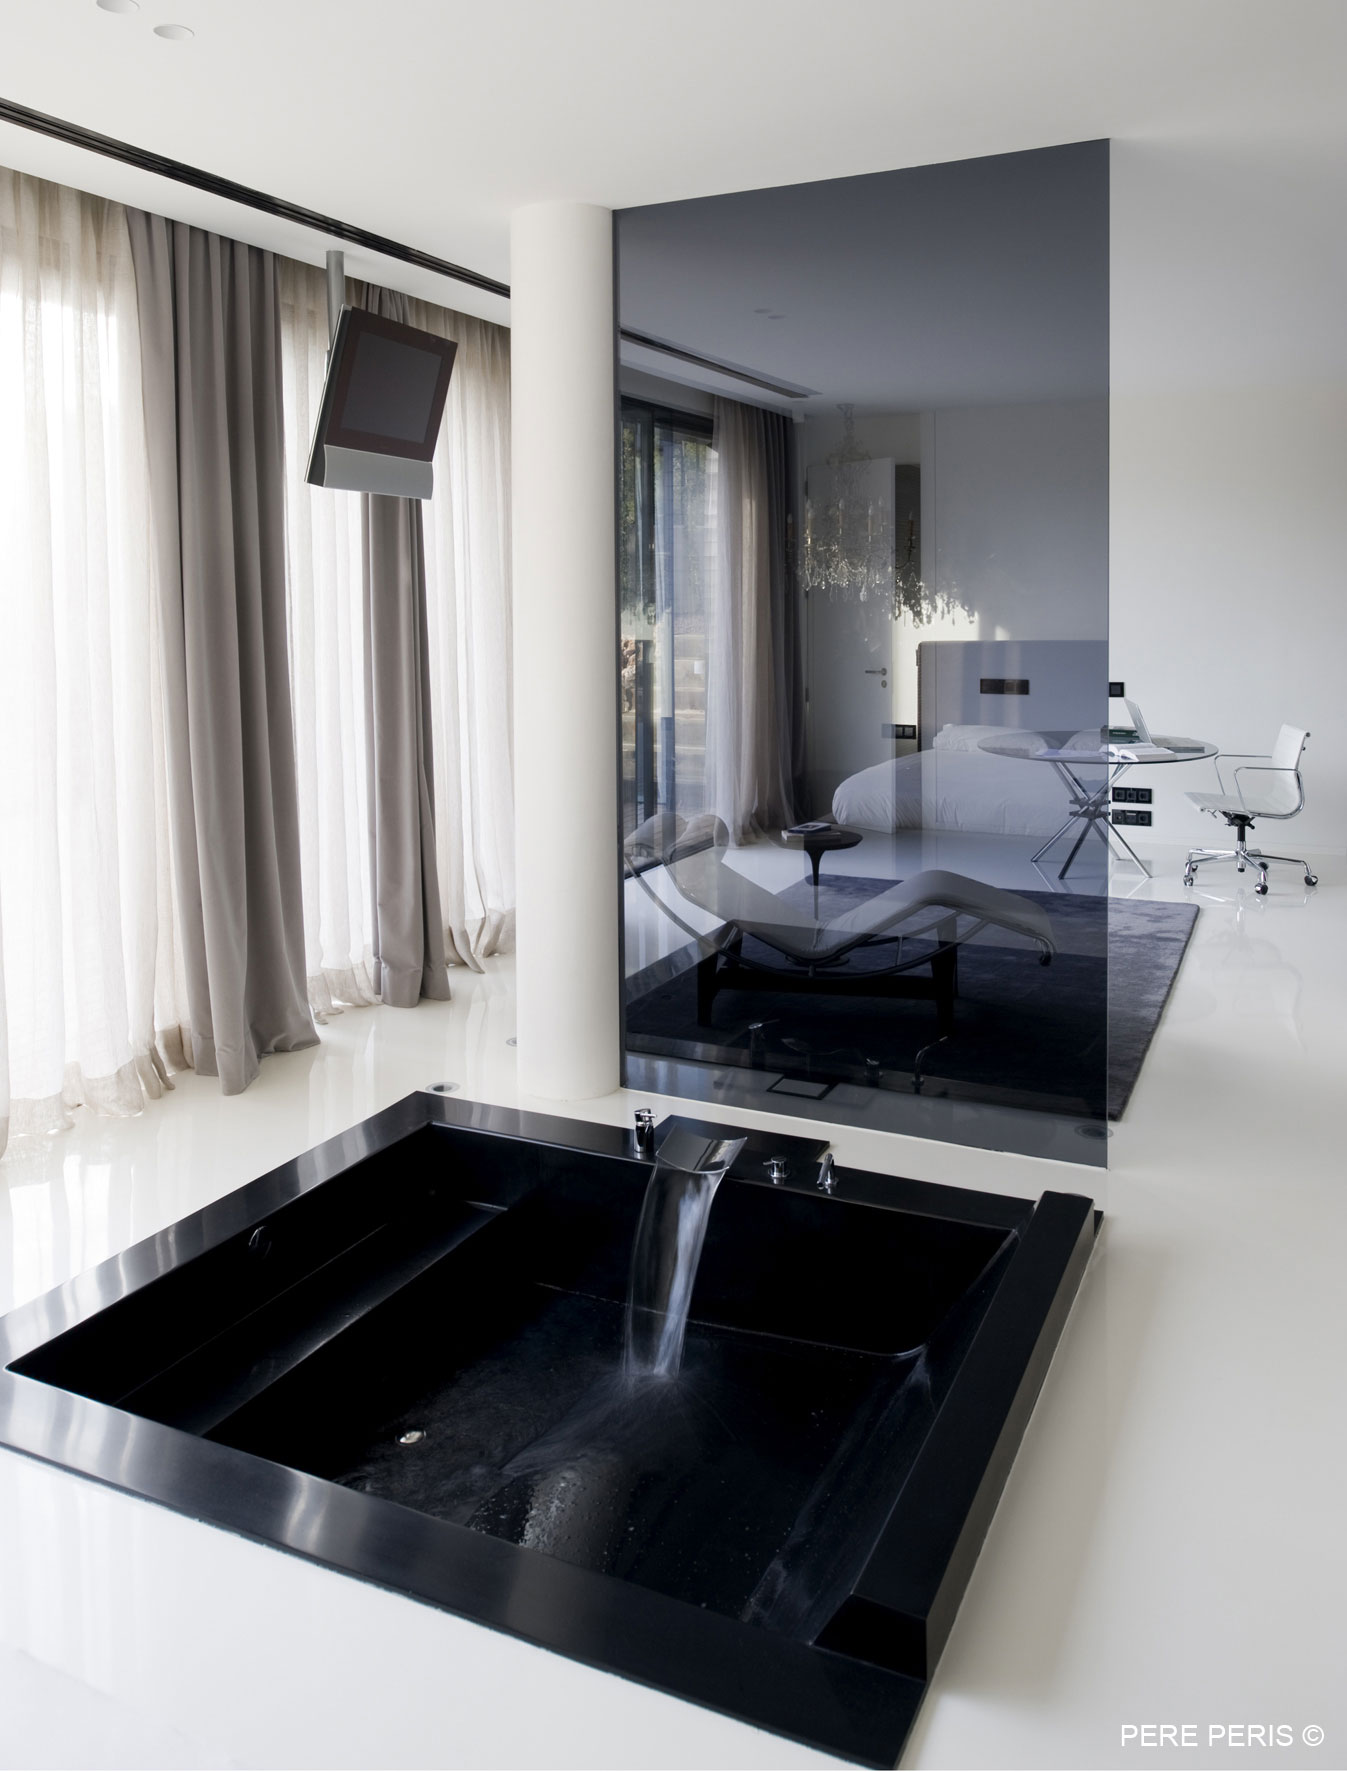 Large Dark Bath, Smoked Glass Screen, Stylish Glass Home in Valencia, Spain